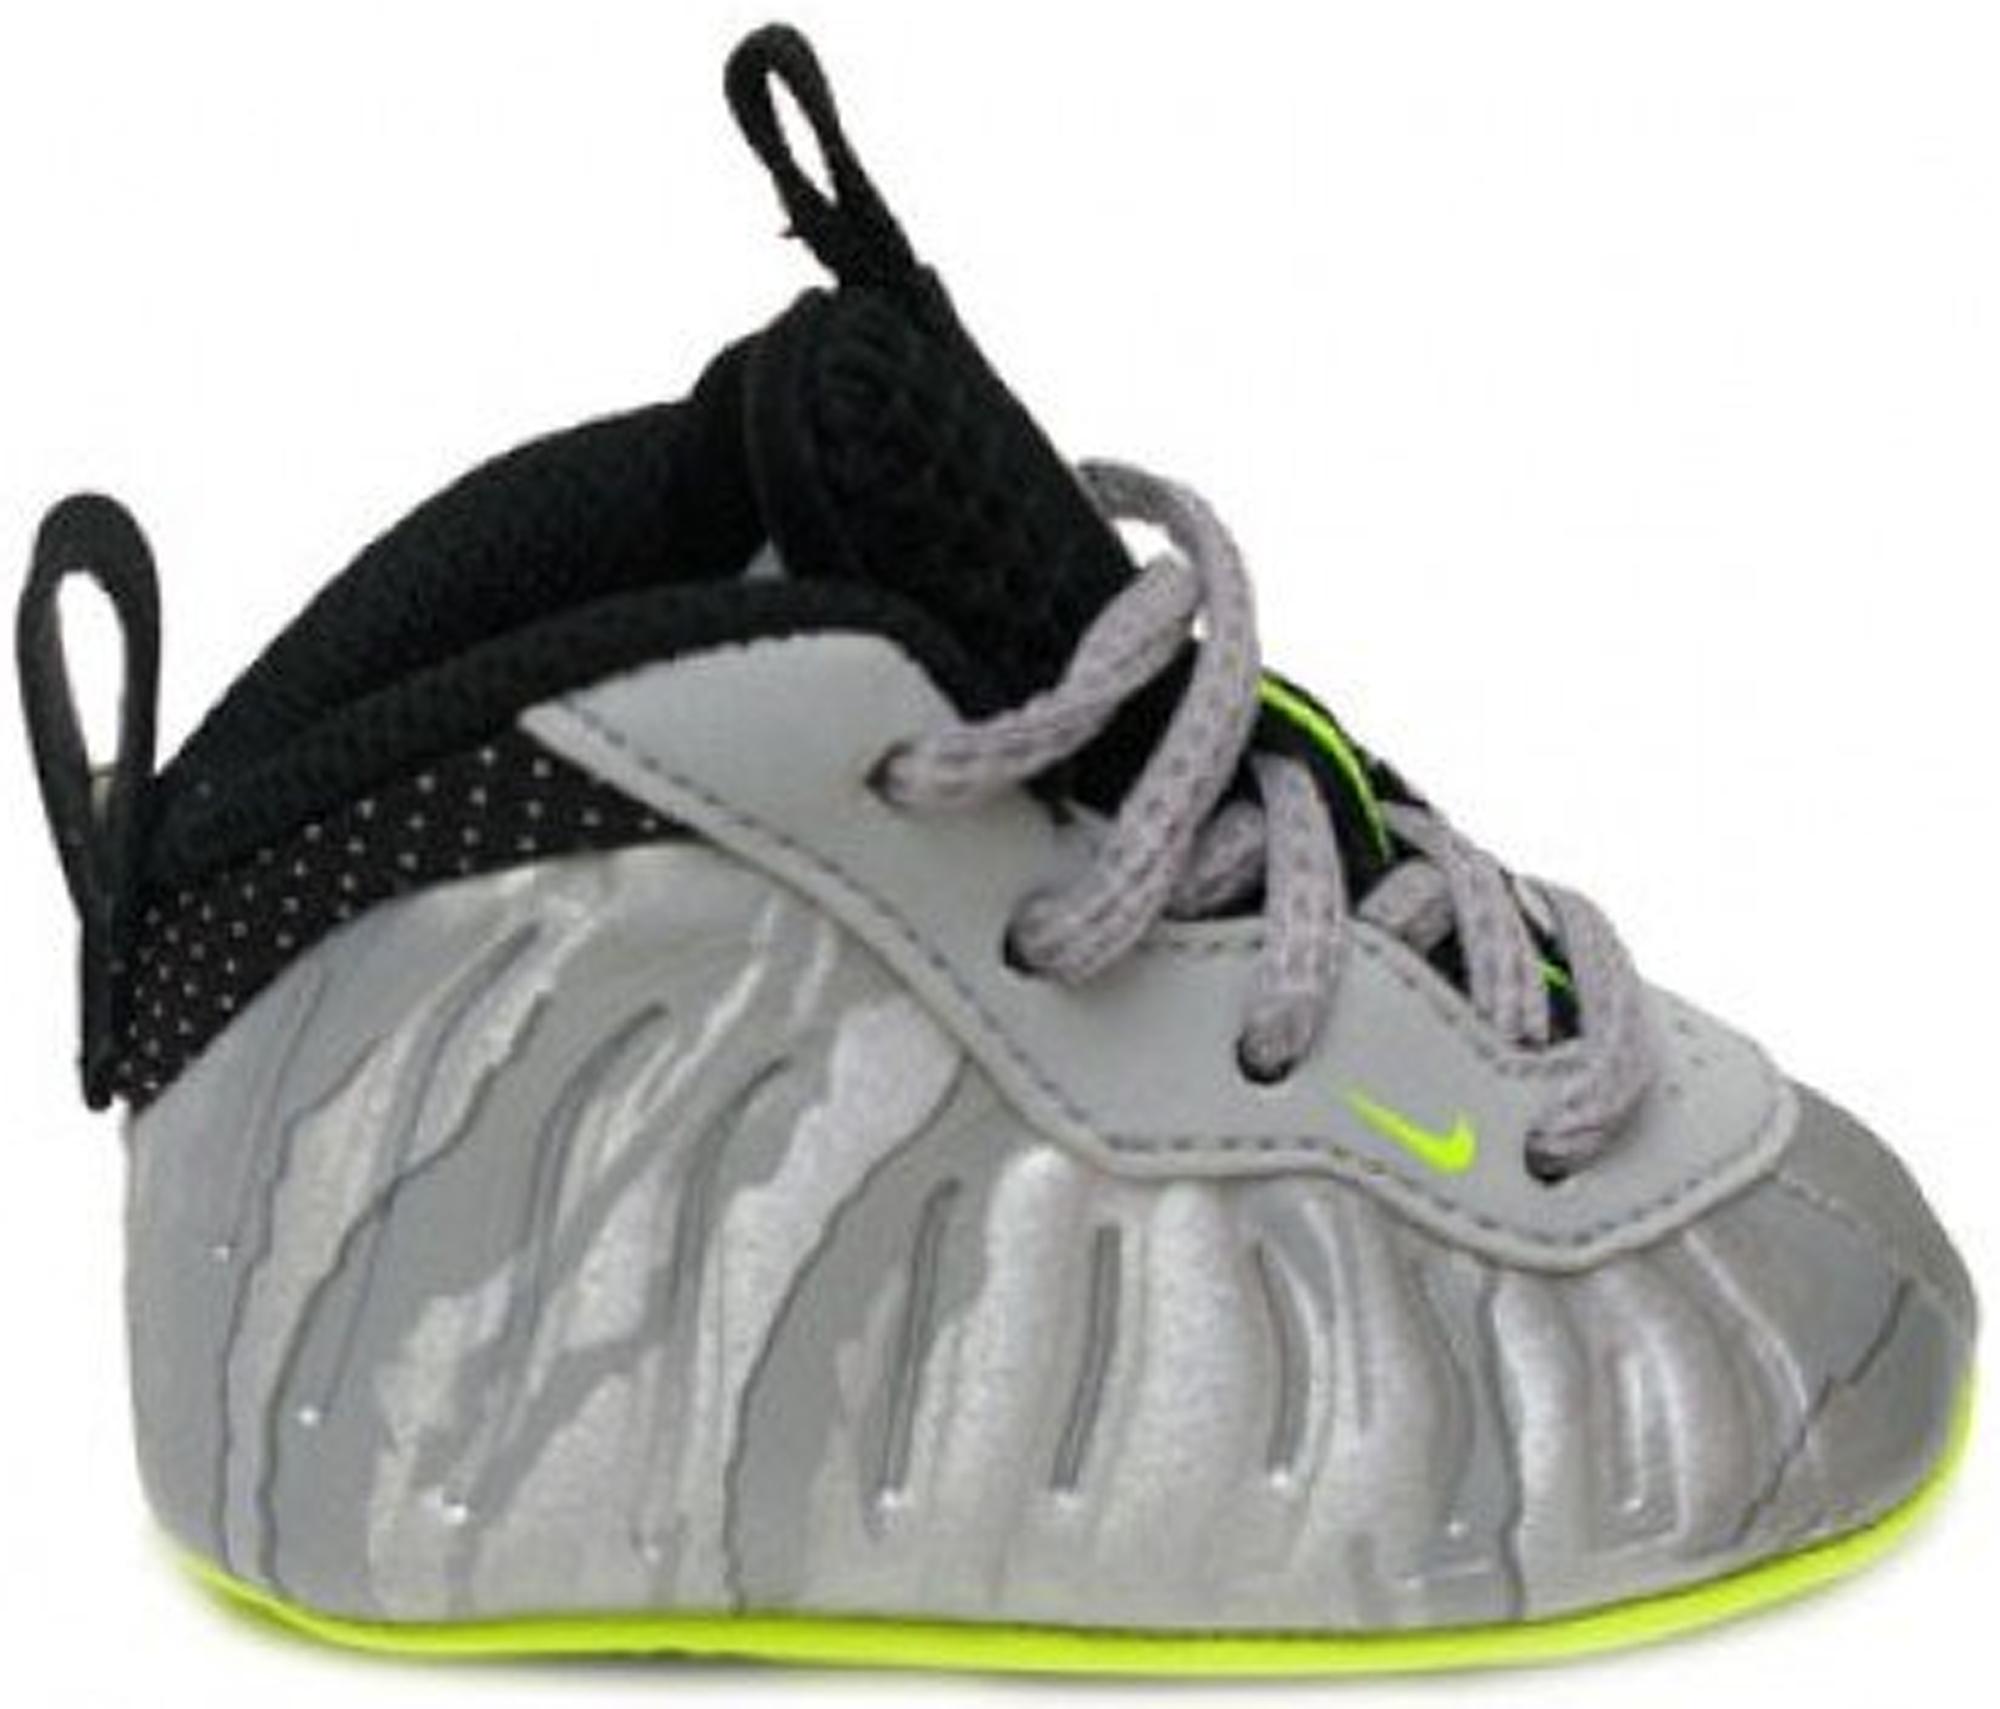 Nike Air Foamposite One Concord Size 12 Deadstock no ...